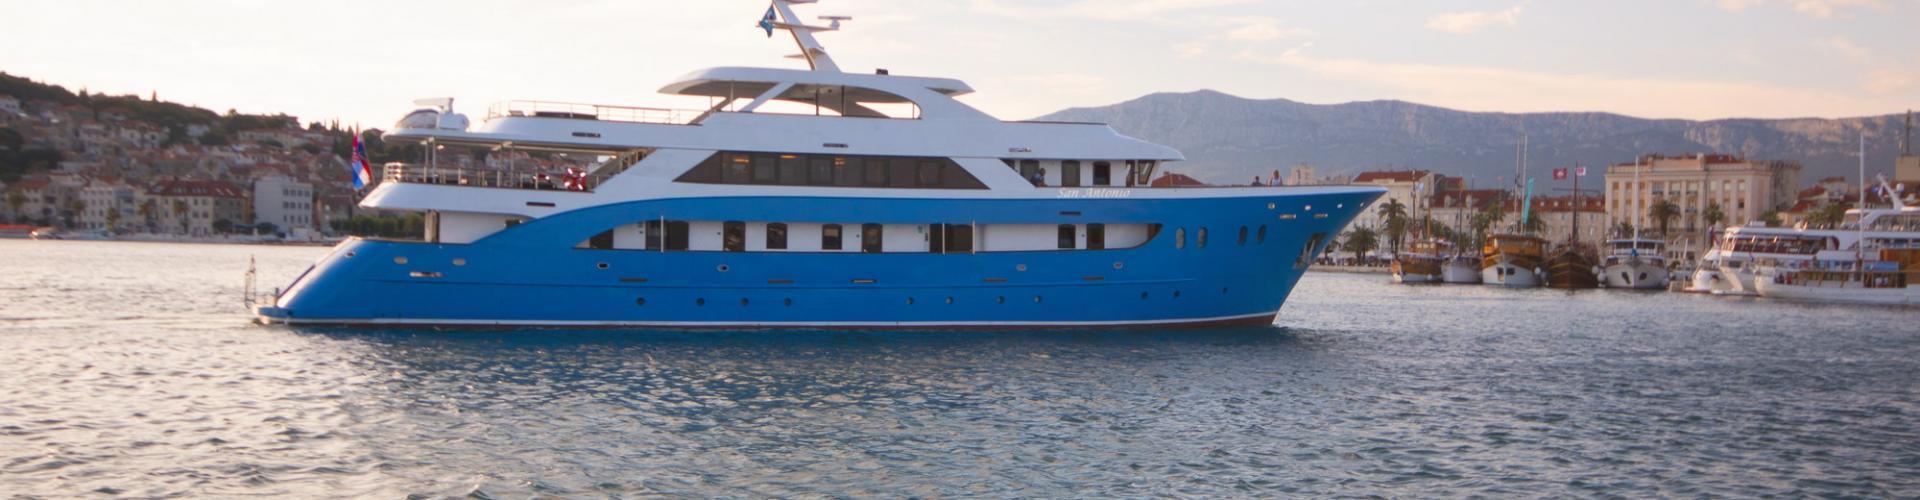 barca a motore Deluxe nave da crociera MV Antonio